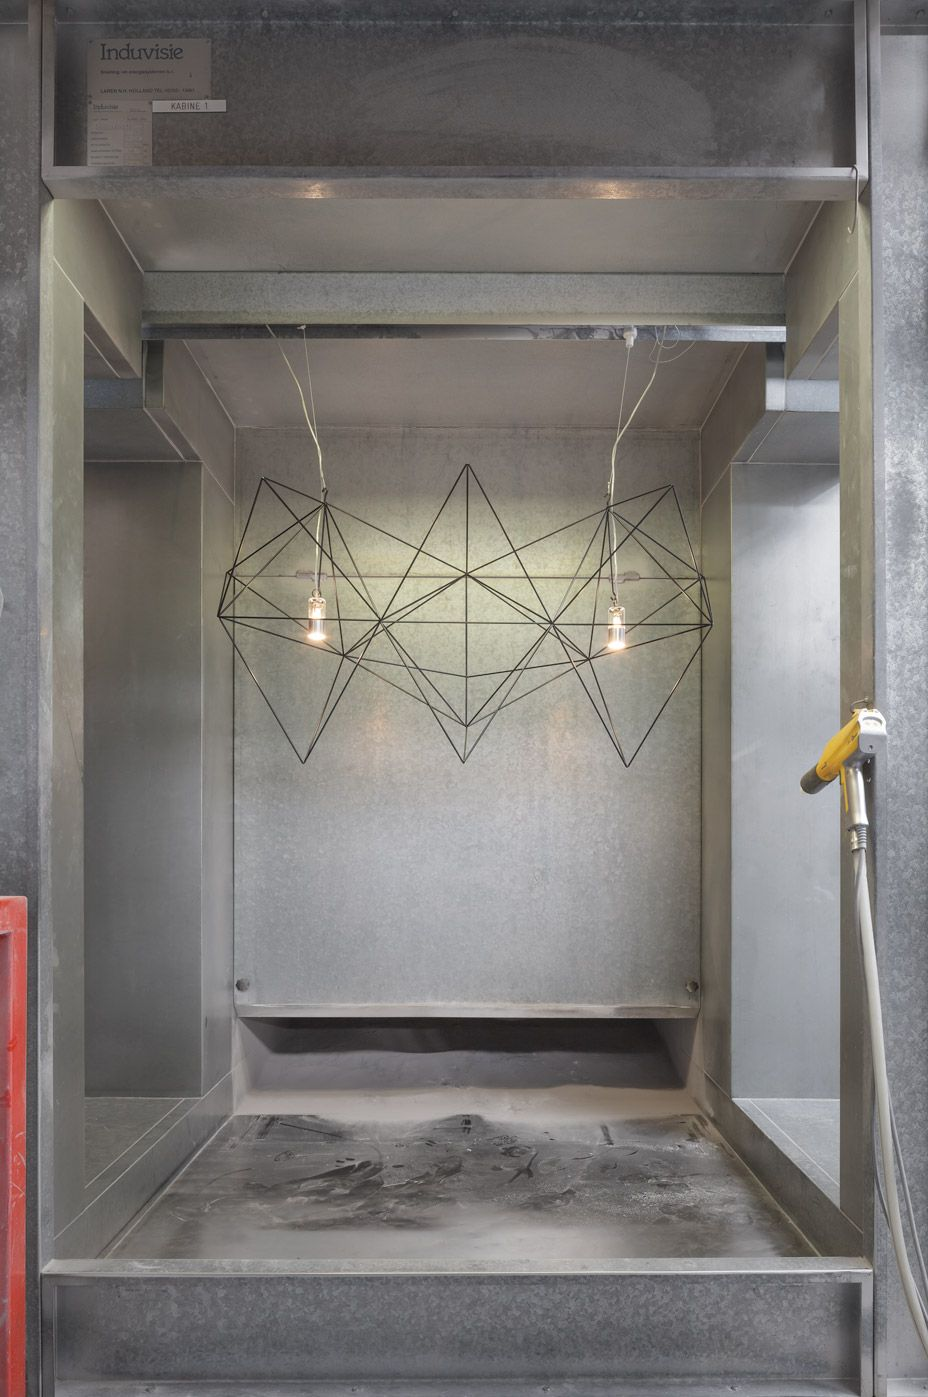 Prism archives nathalie dewez nathalie dewez studio inspo